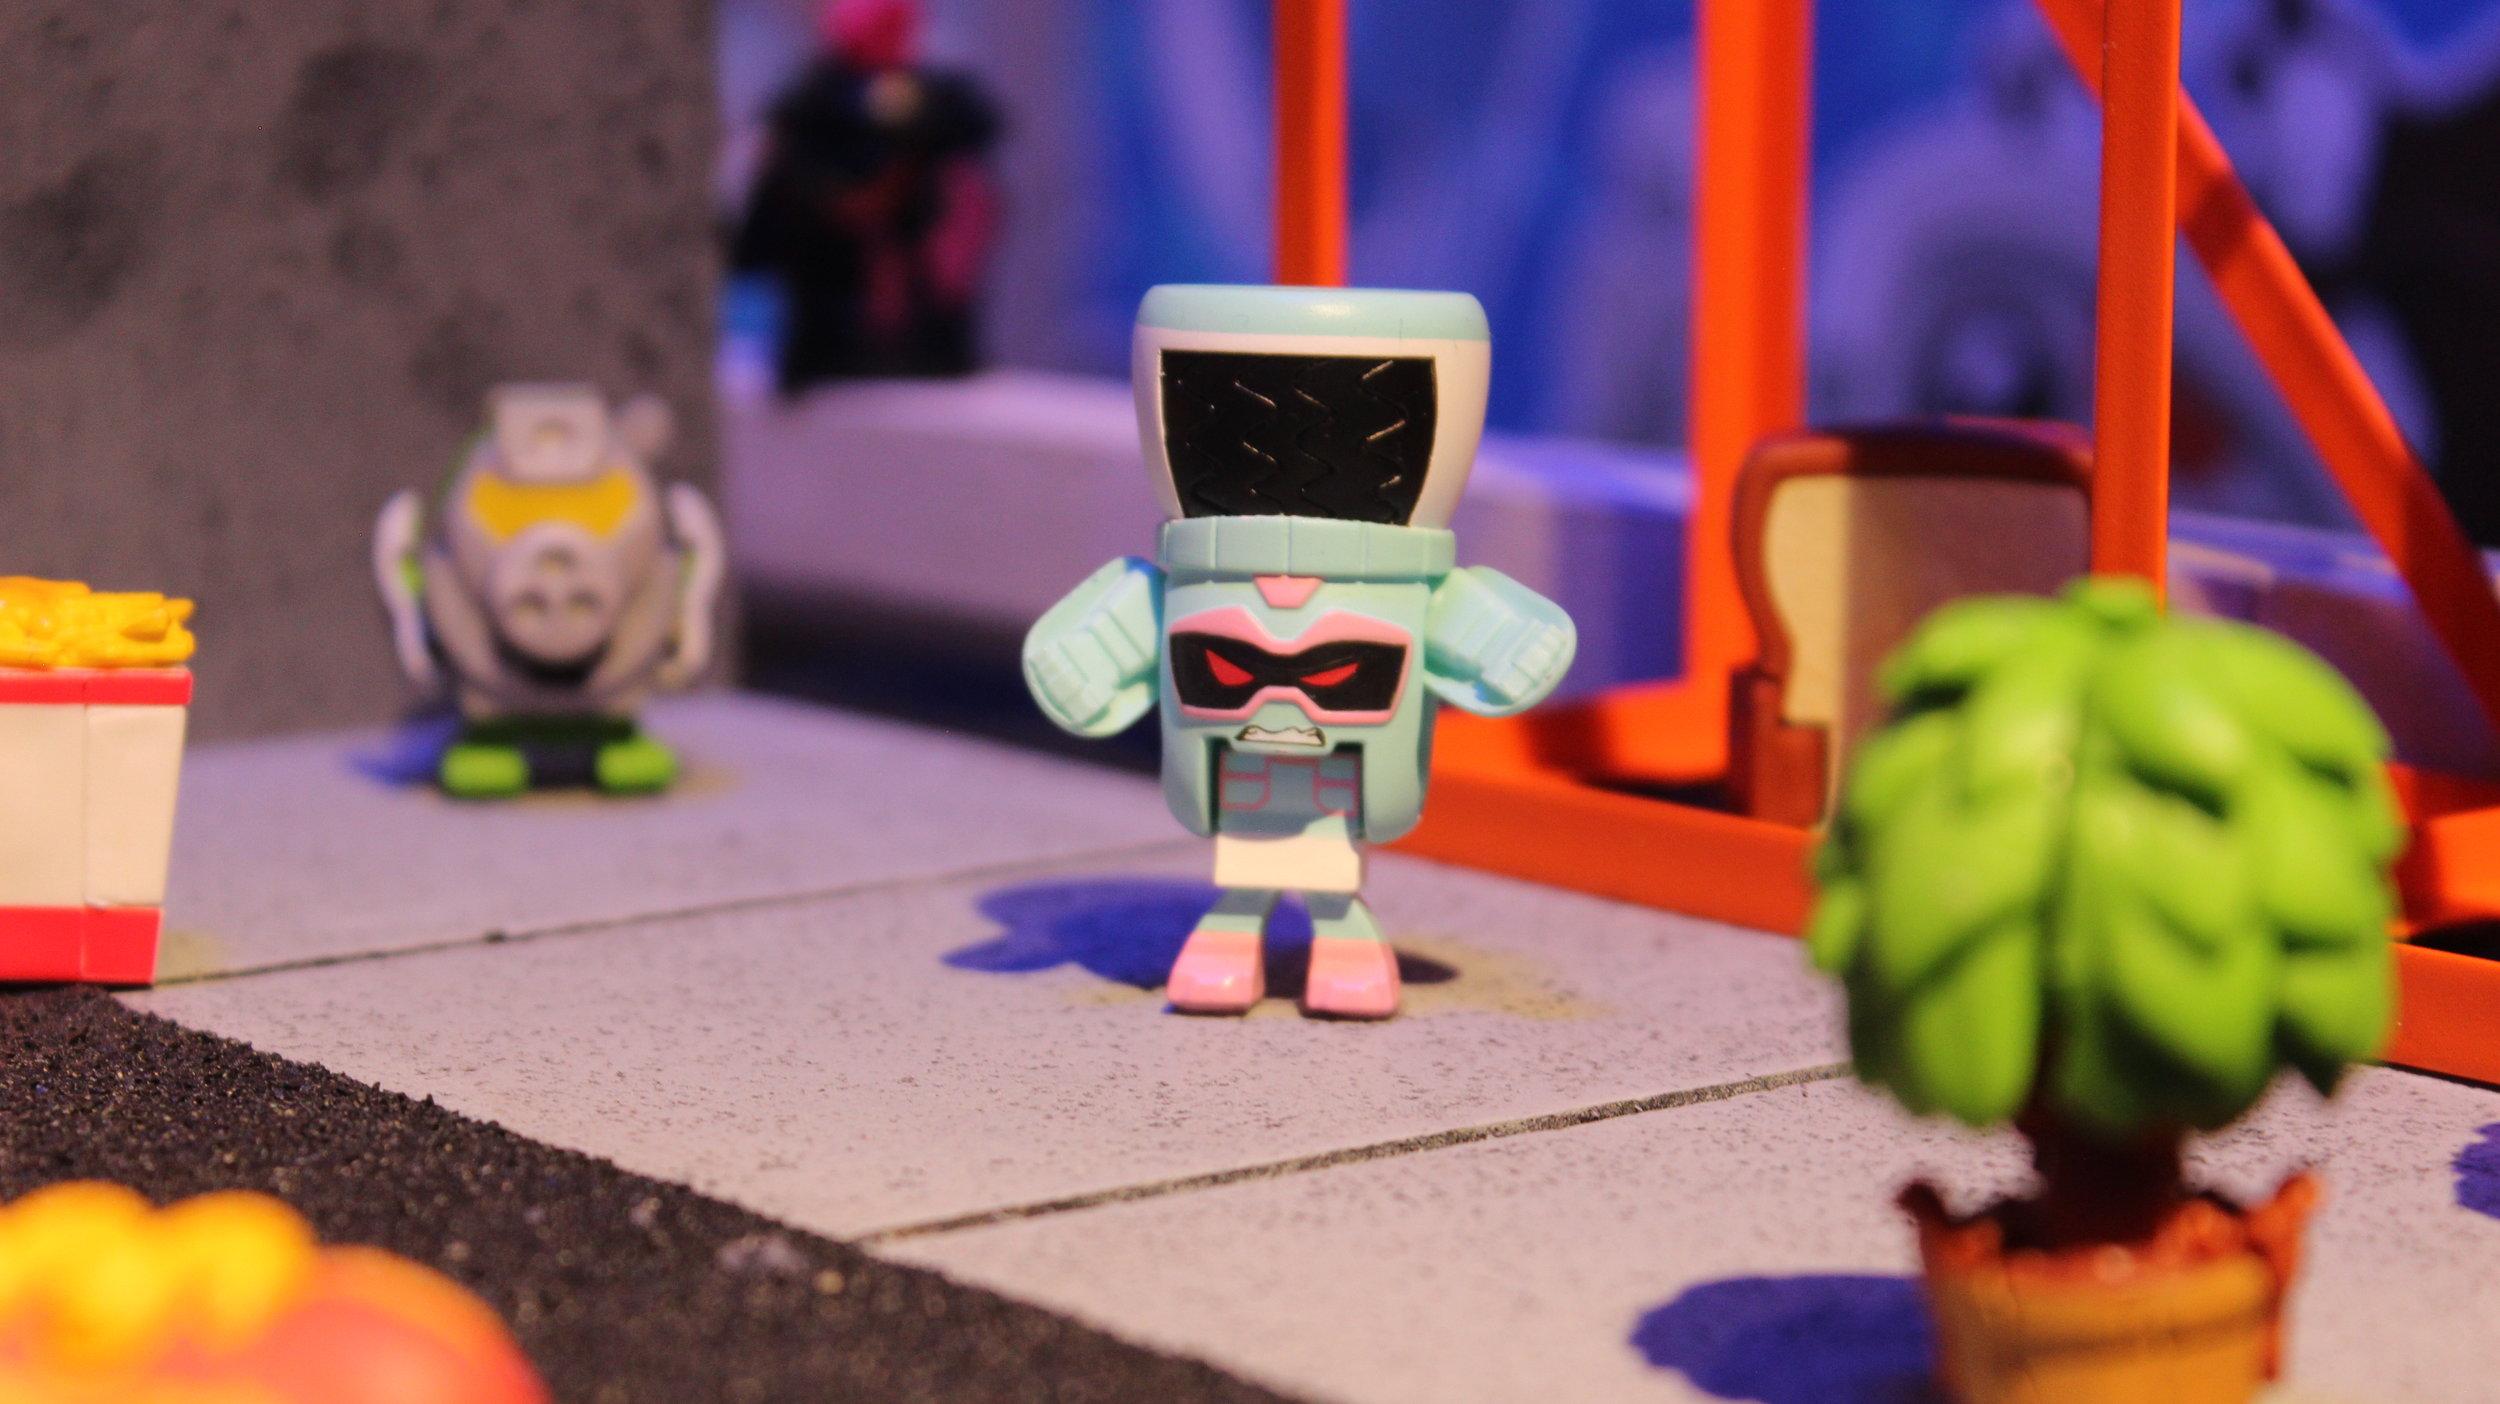 Bot Bots 5.JPG